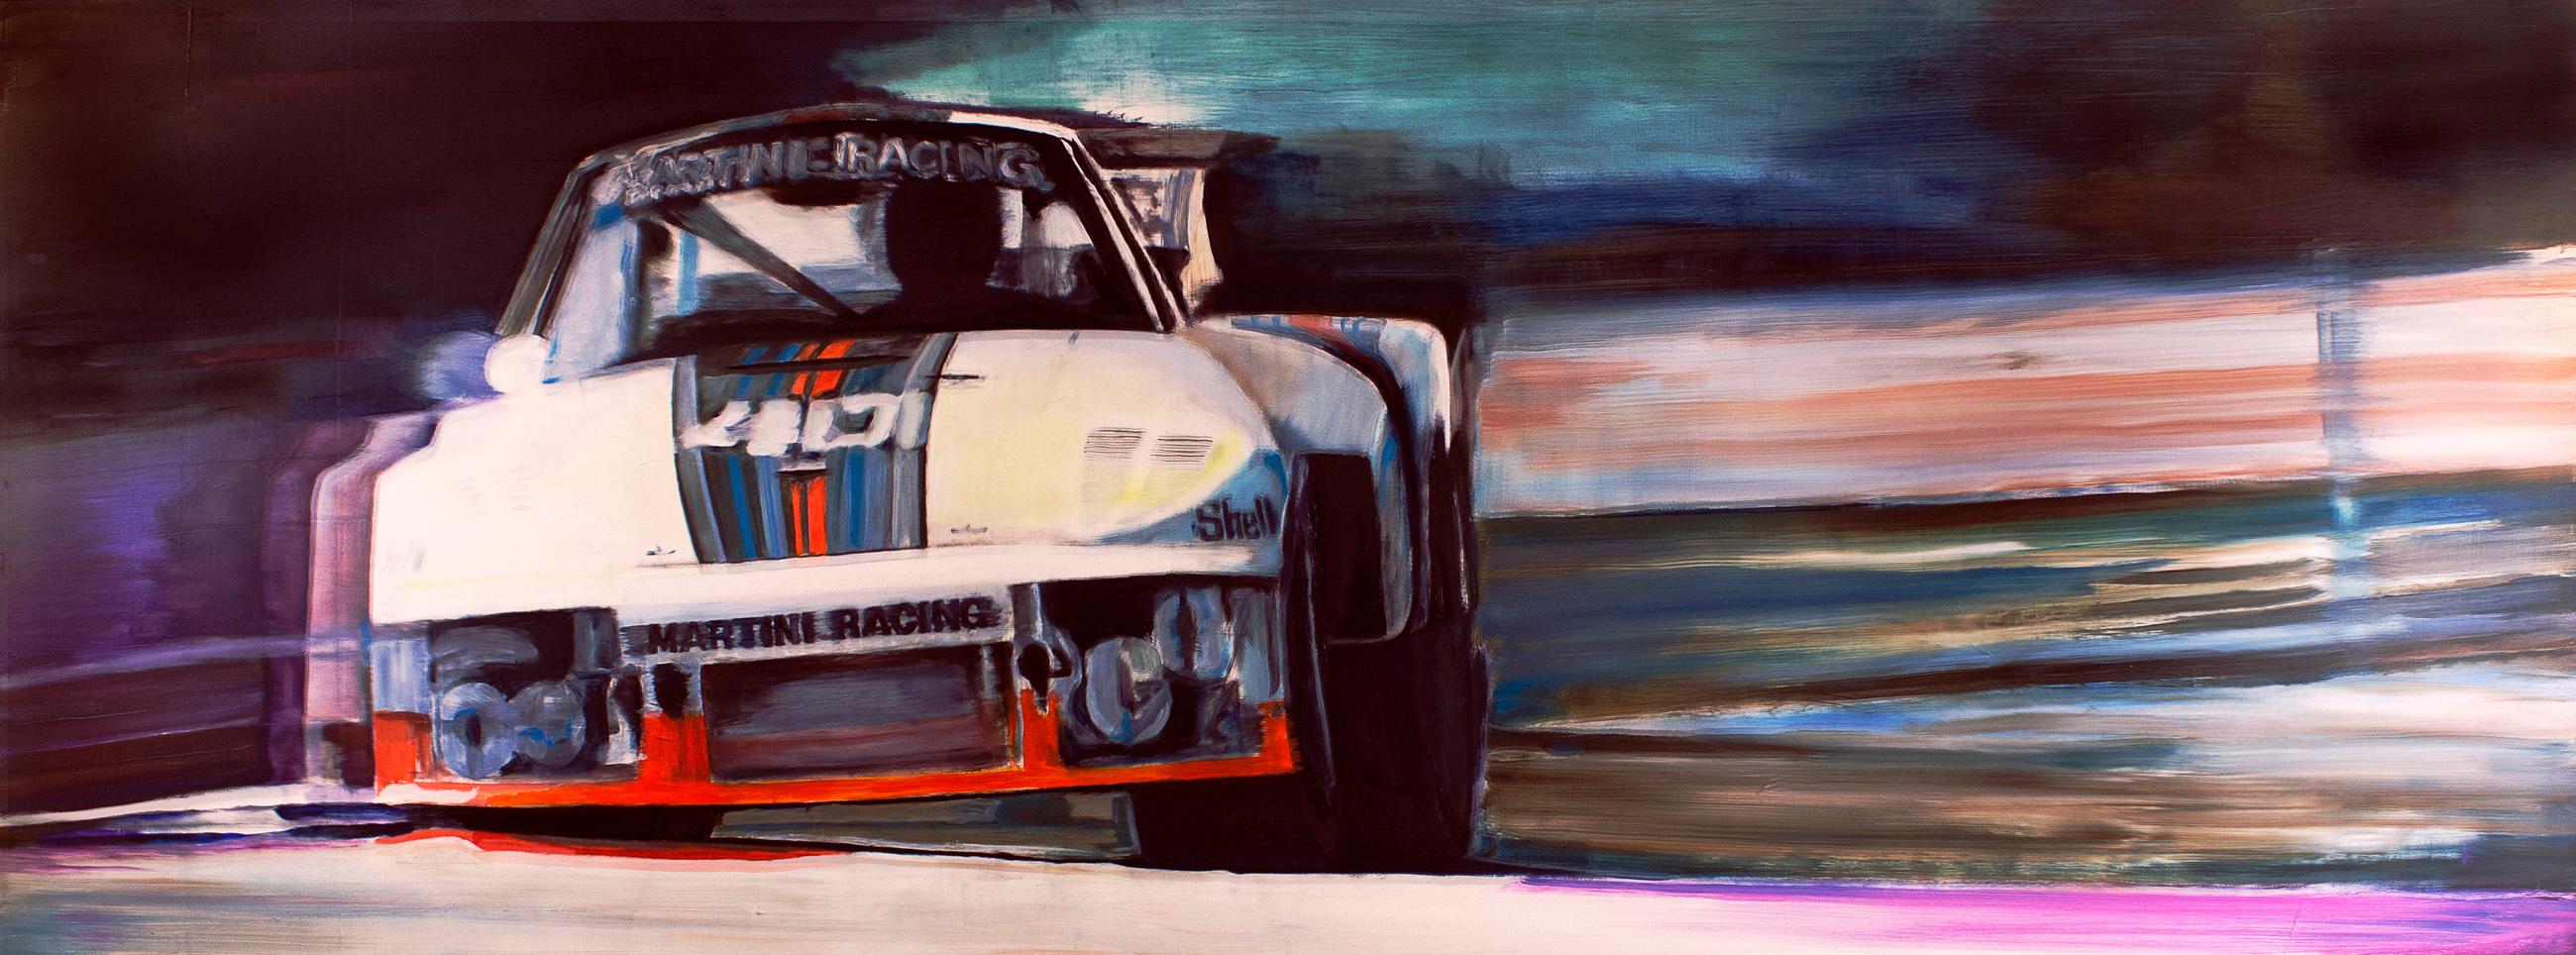 Porsche 935 web qbqi6m